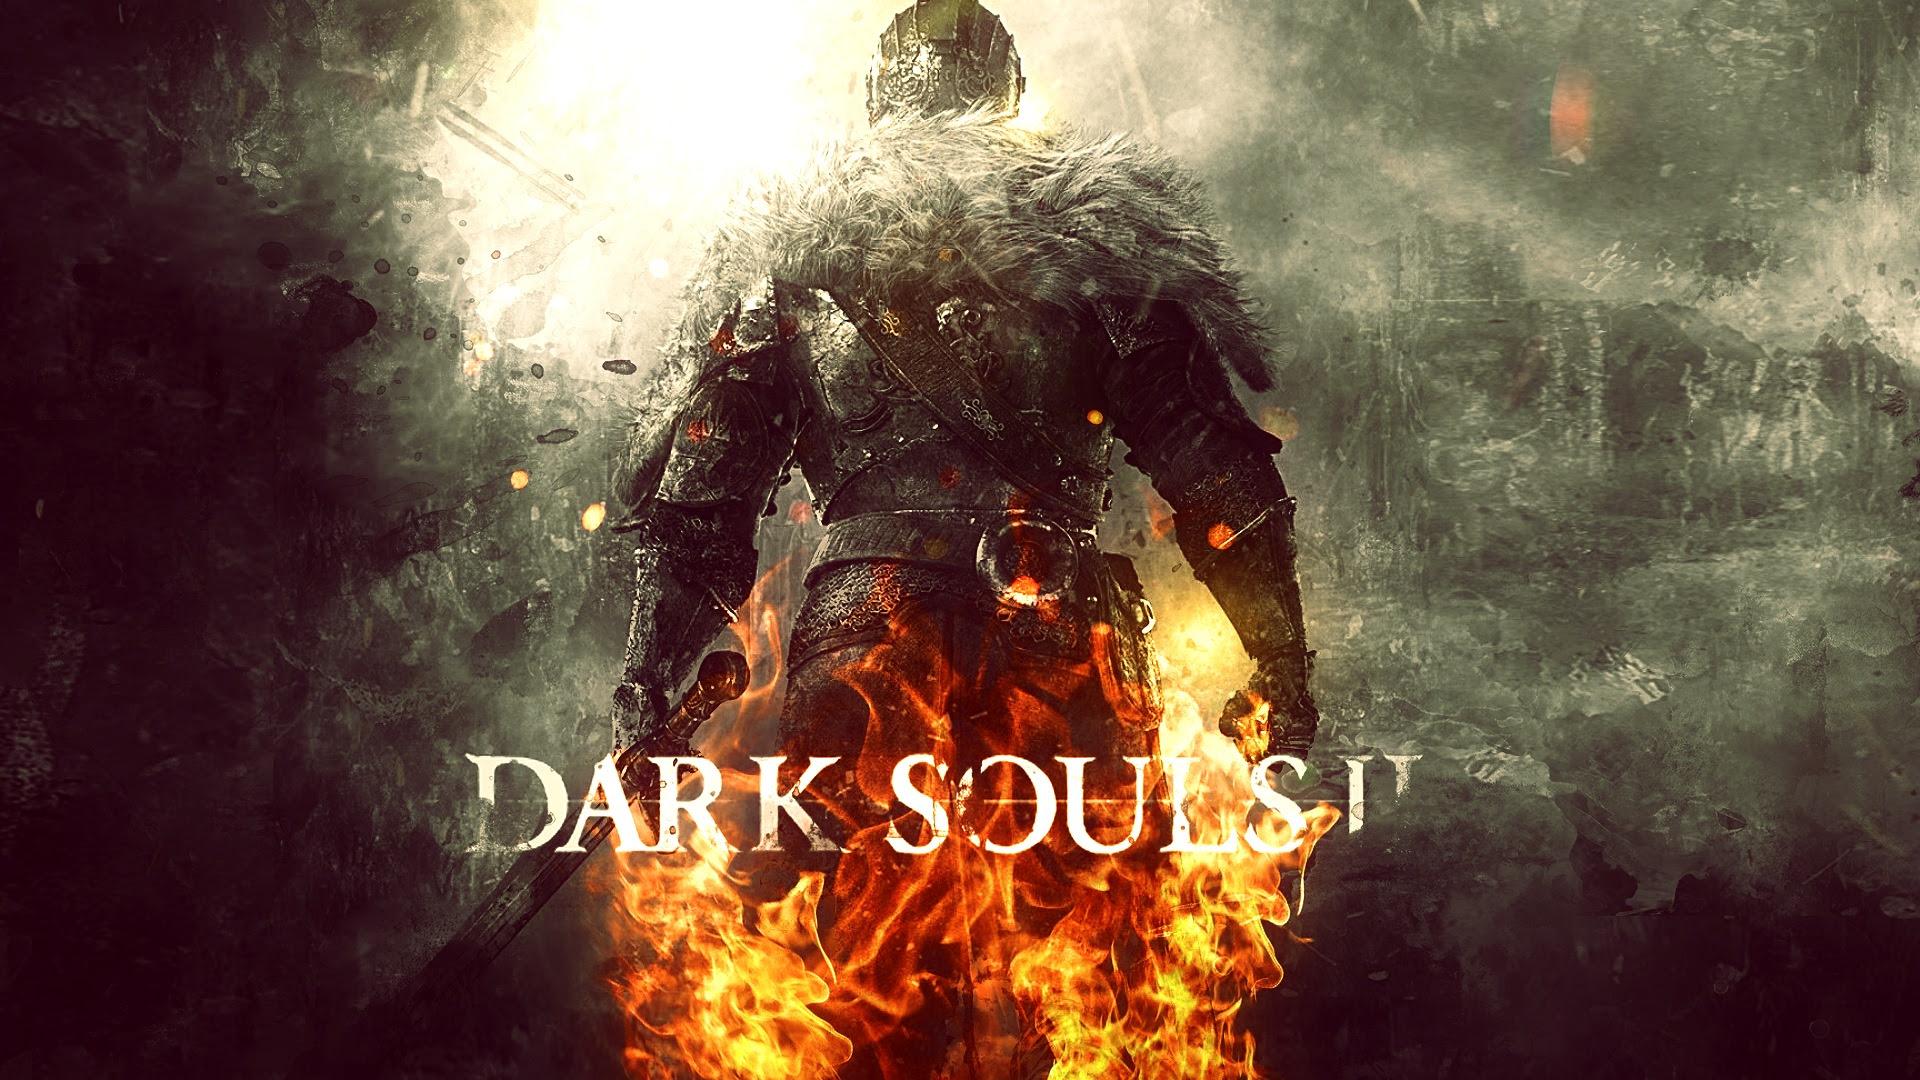 Dark Souls 2 Game Hd Wallpapers 14 1920x1080 Wallpaper Download